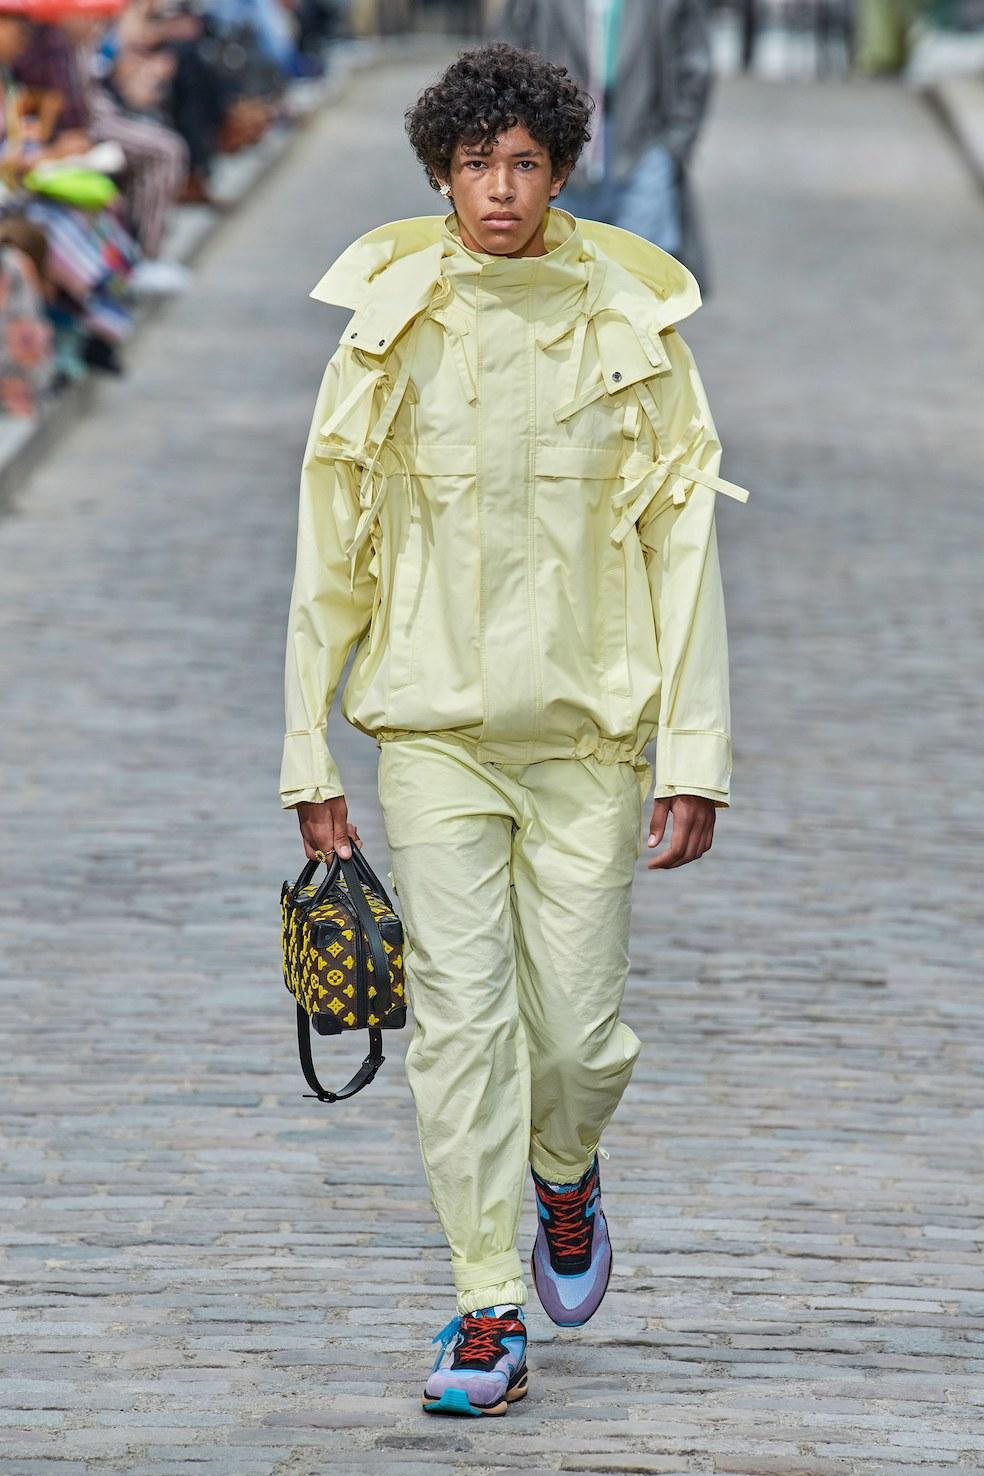 Louis_Vuitton_SS20_Behind_The_Blinds_Magazine__FIO0105.jpg